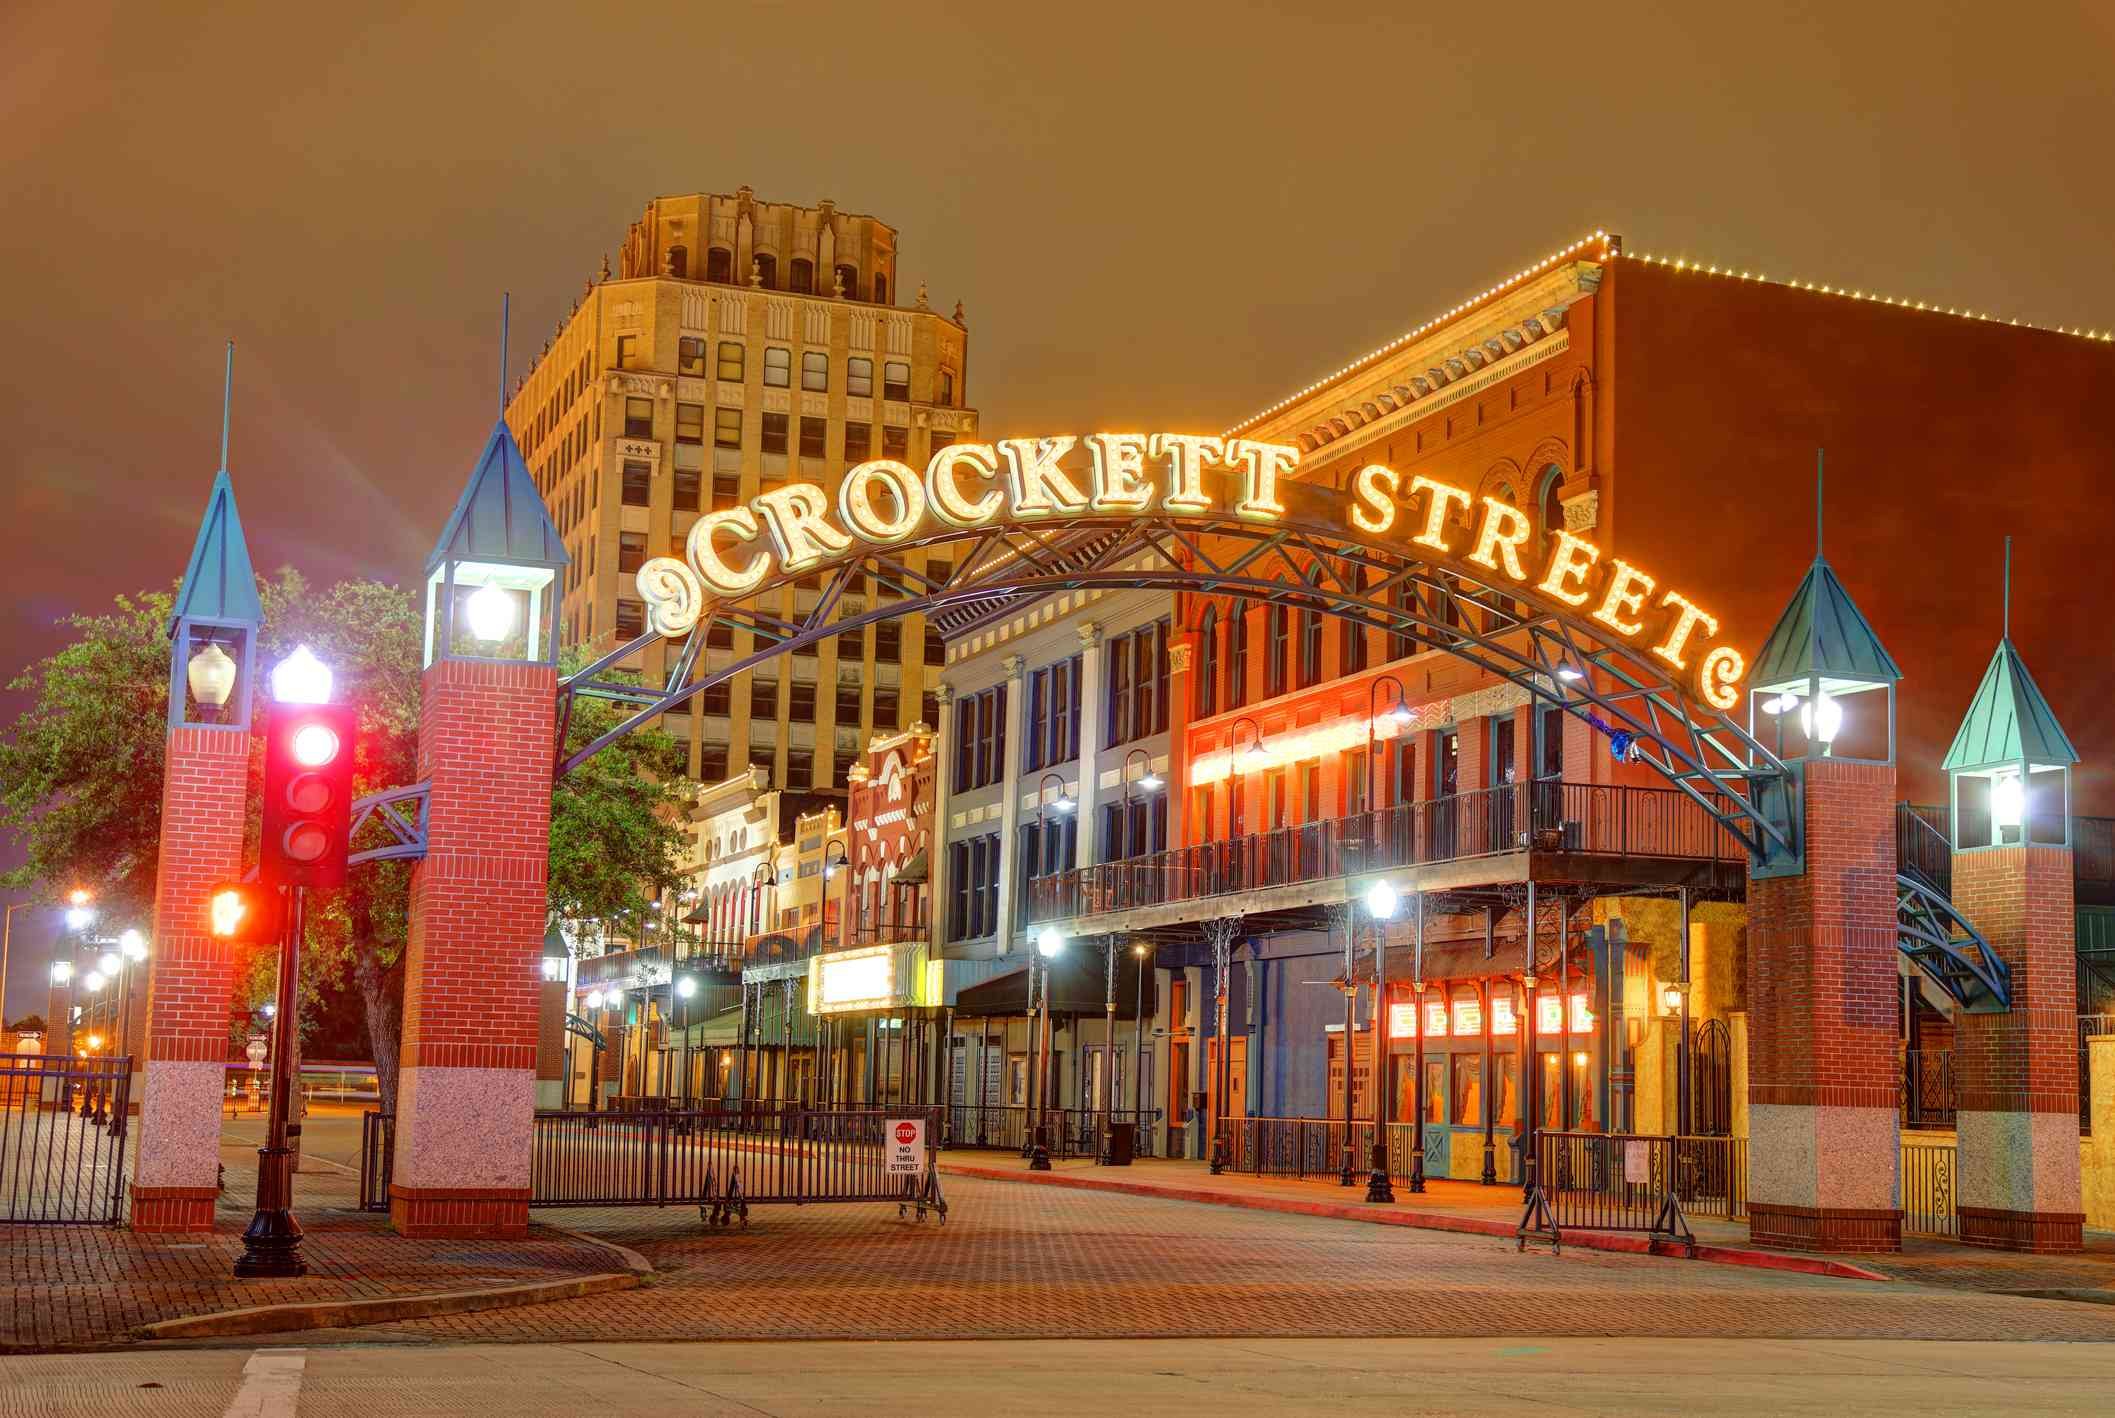 Crockett Street in Beaumont Texas